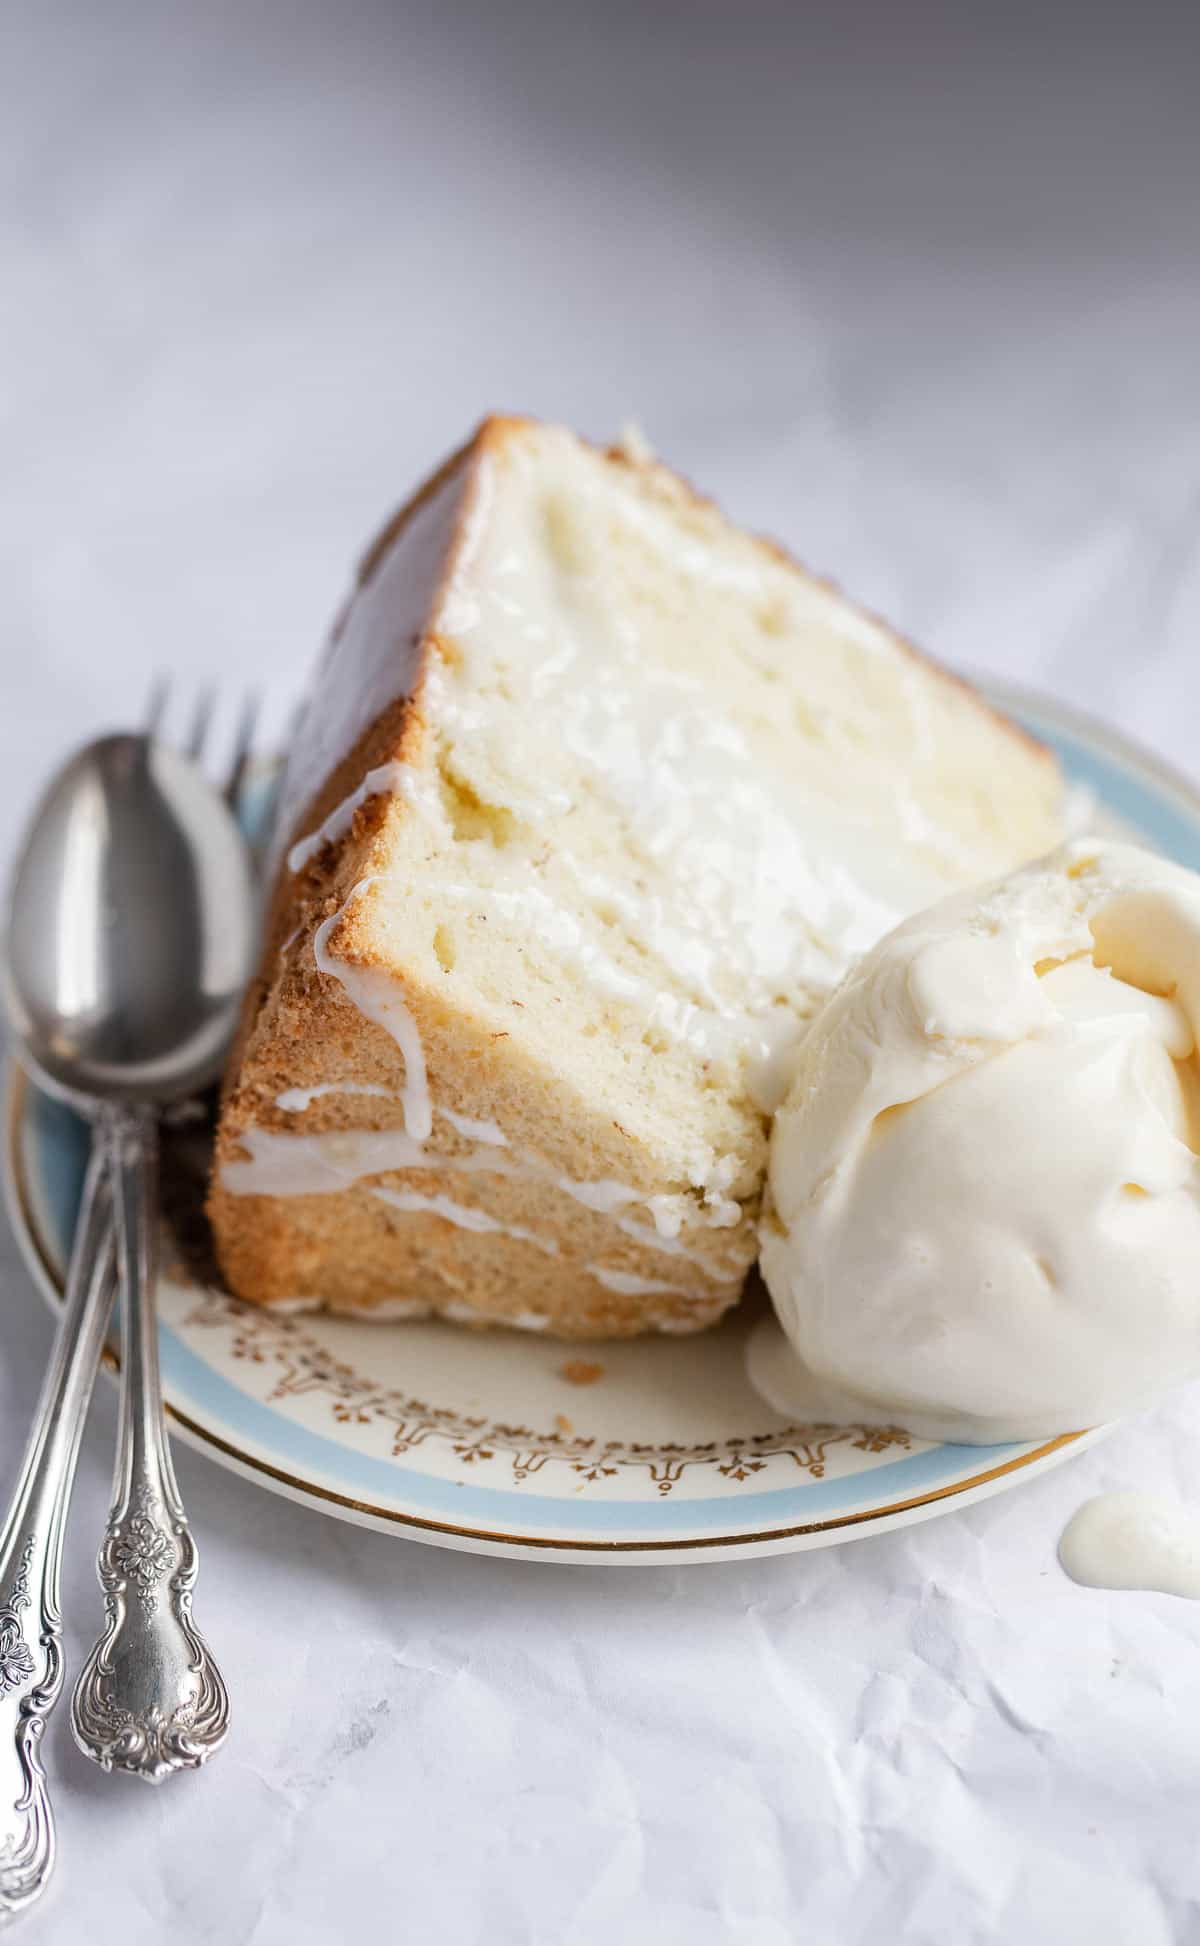 Banana Chiffon Cake a light, fluffy cake with tender bite and rich banana flavor. chiffon cake | chiffon cake recipe | chiffon cake with lemon glaze | ripe banana recipes